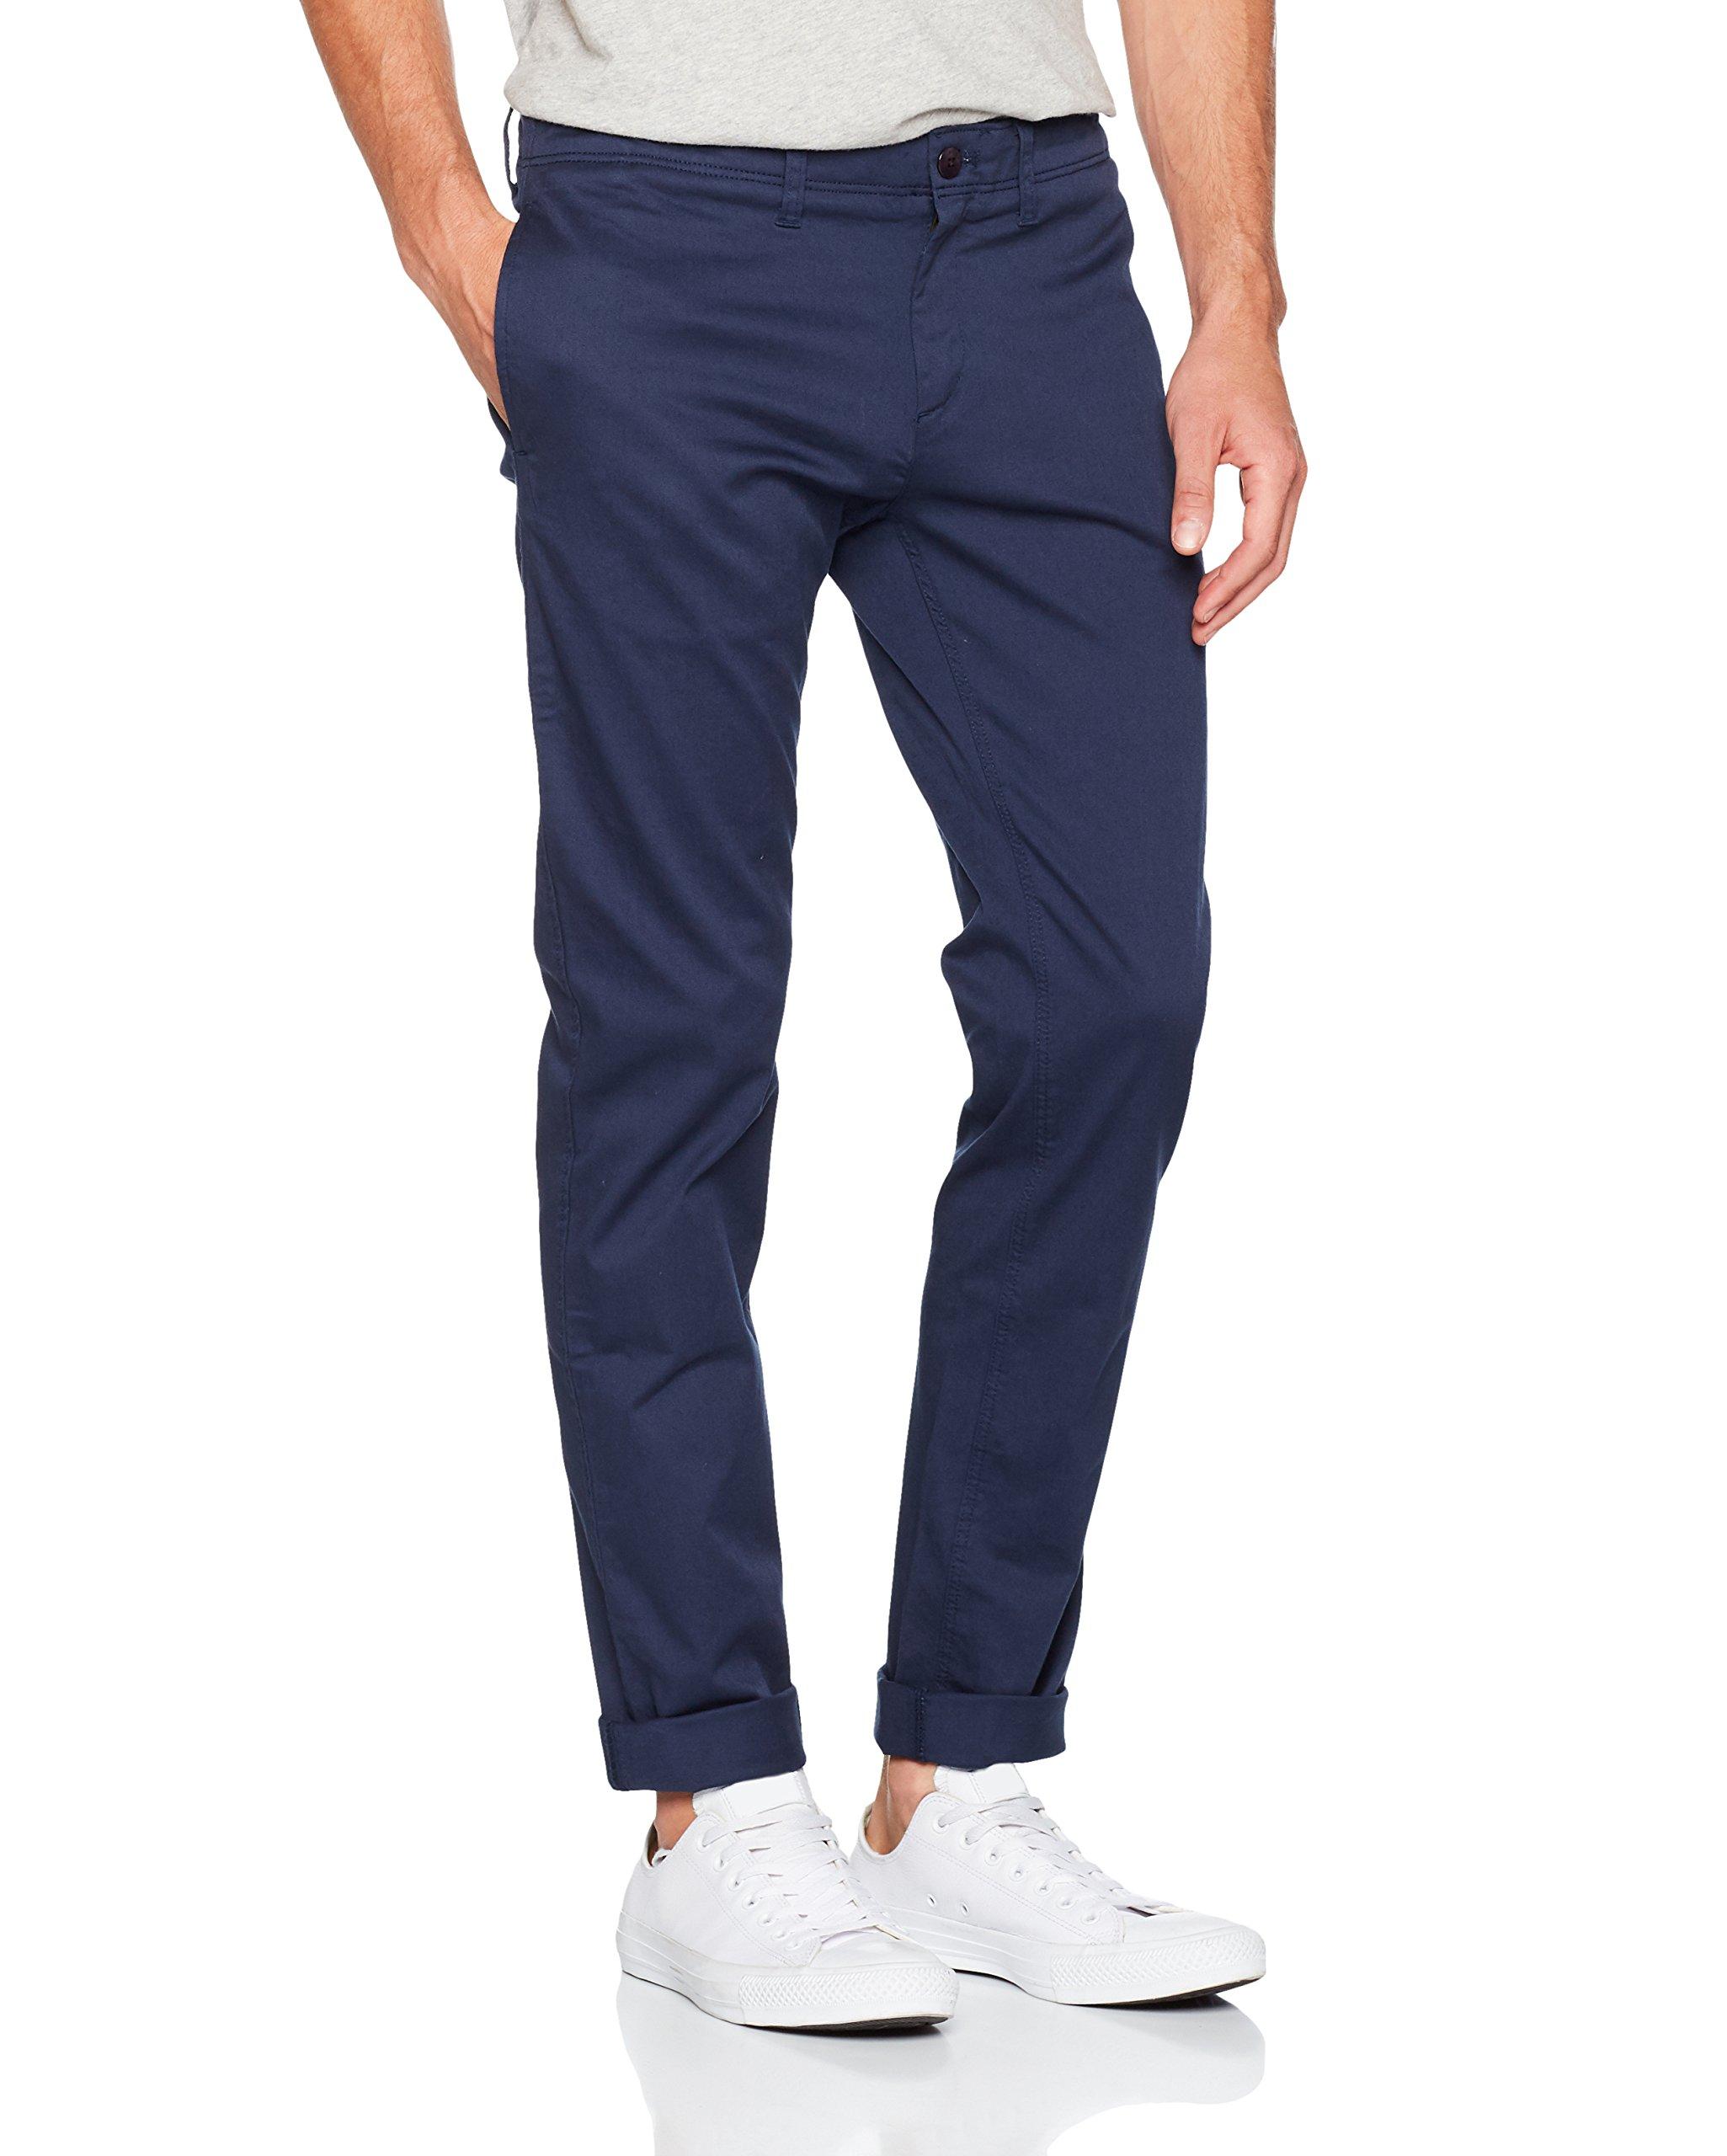 Bleublack Chino Basic 002taille Str l34 Tommy Slim Jeans Homme FabricantW32 Pantalon Iris WYE29IDH